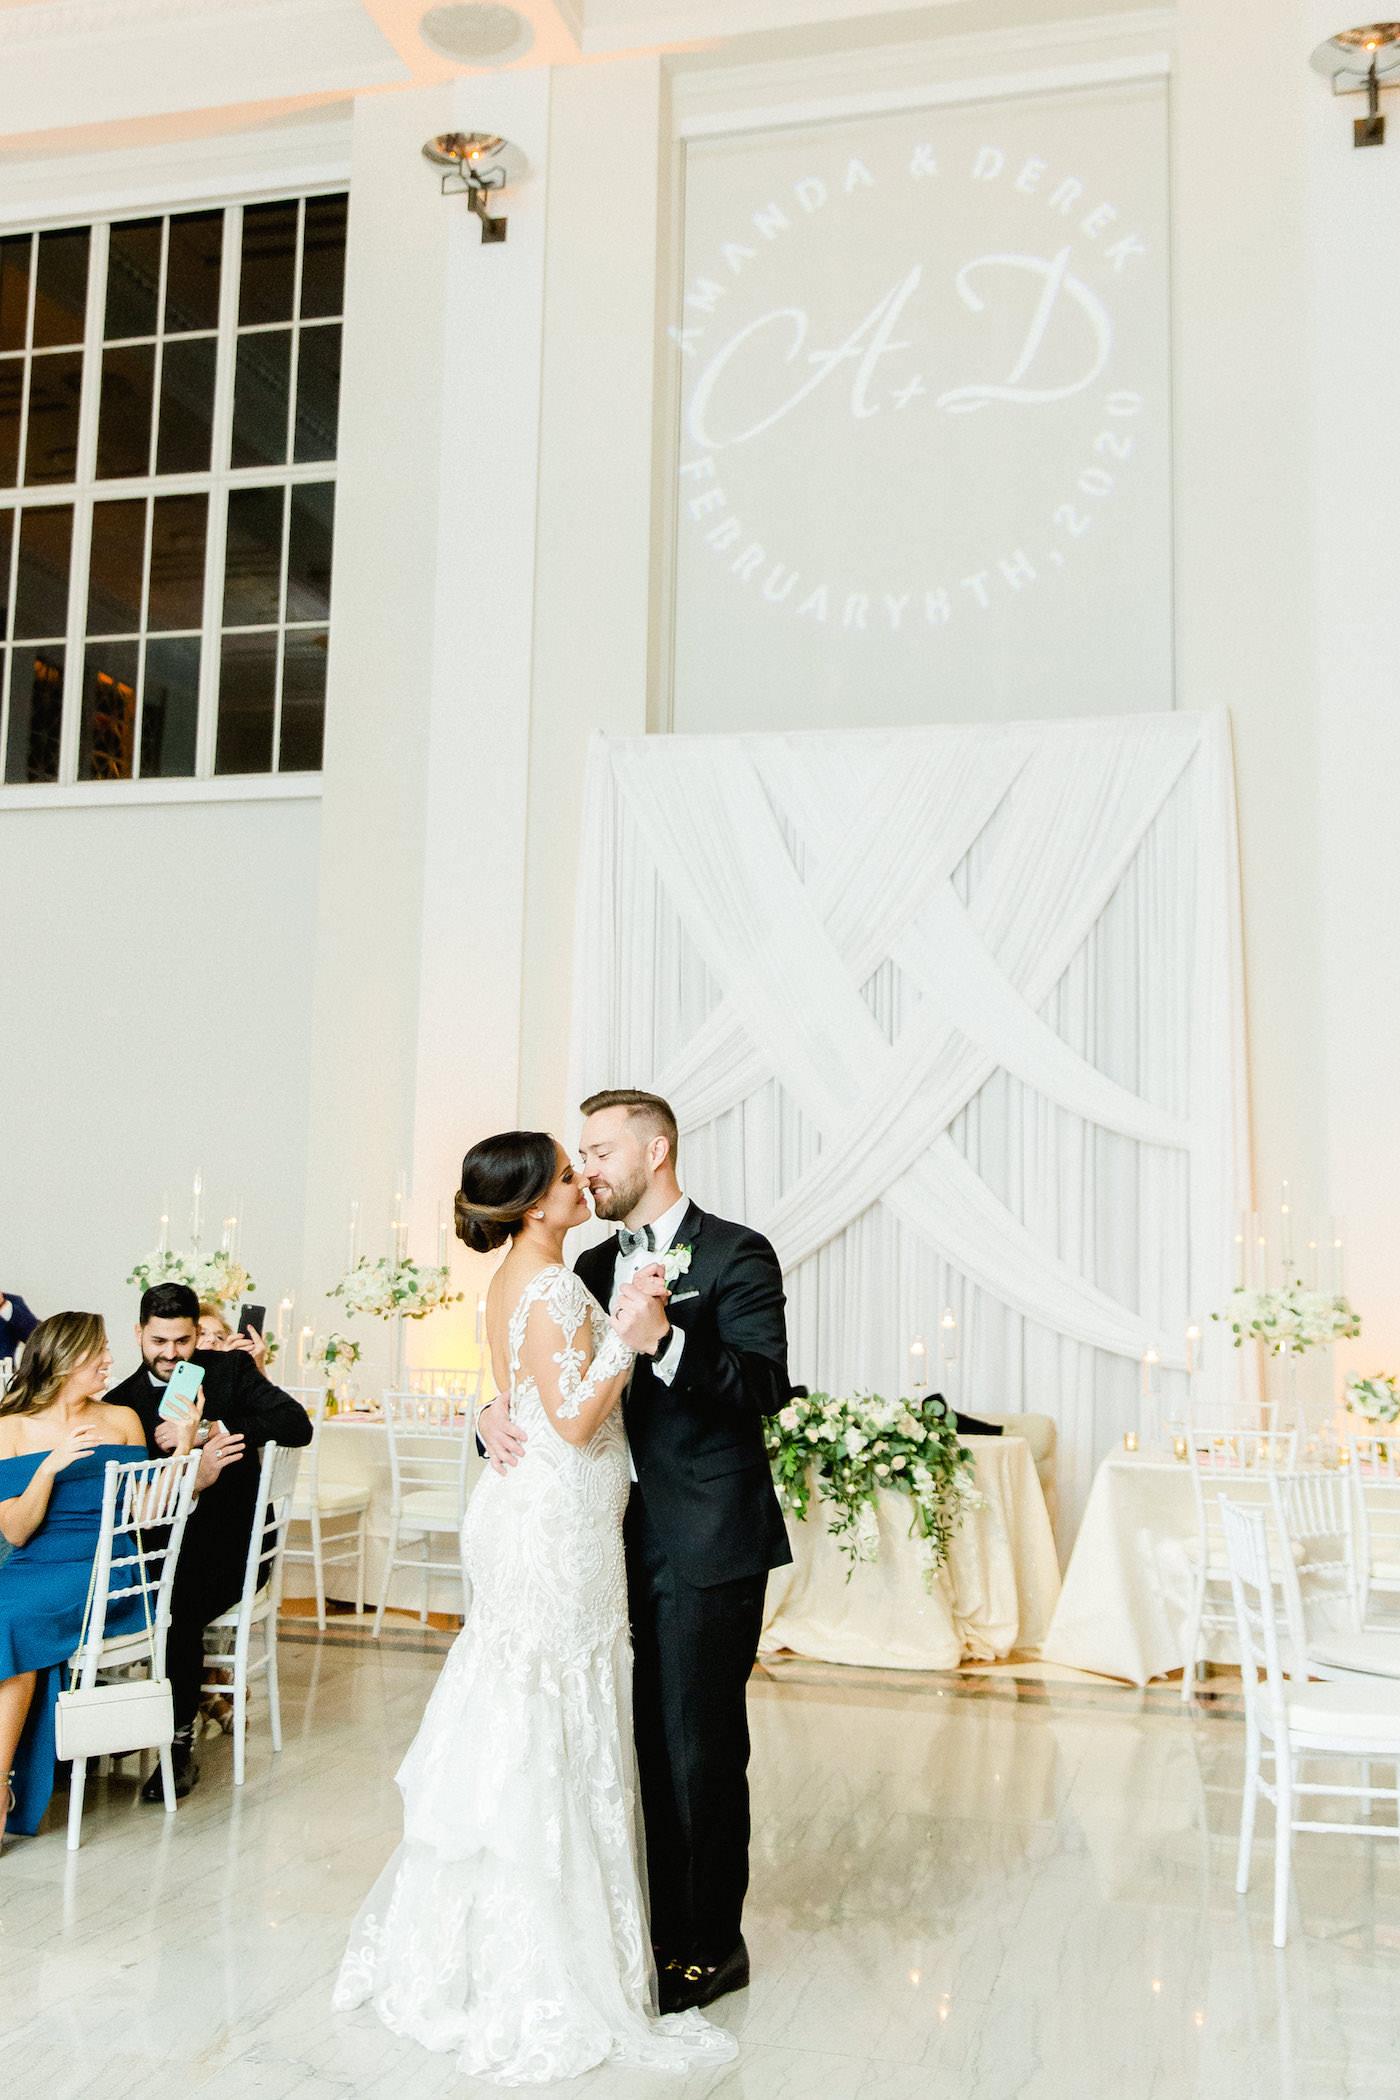 Timeless Elegant Tampa Bay Bride and Groom First Dance During Wedding Reception Portrait | Florida Wedding Venue The Vault | Tampa Wedding Planner Breezin' Weddings